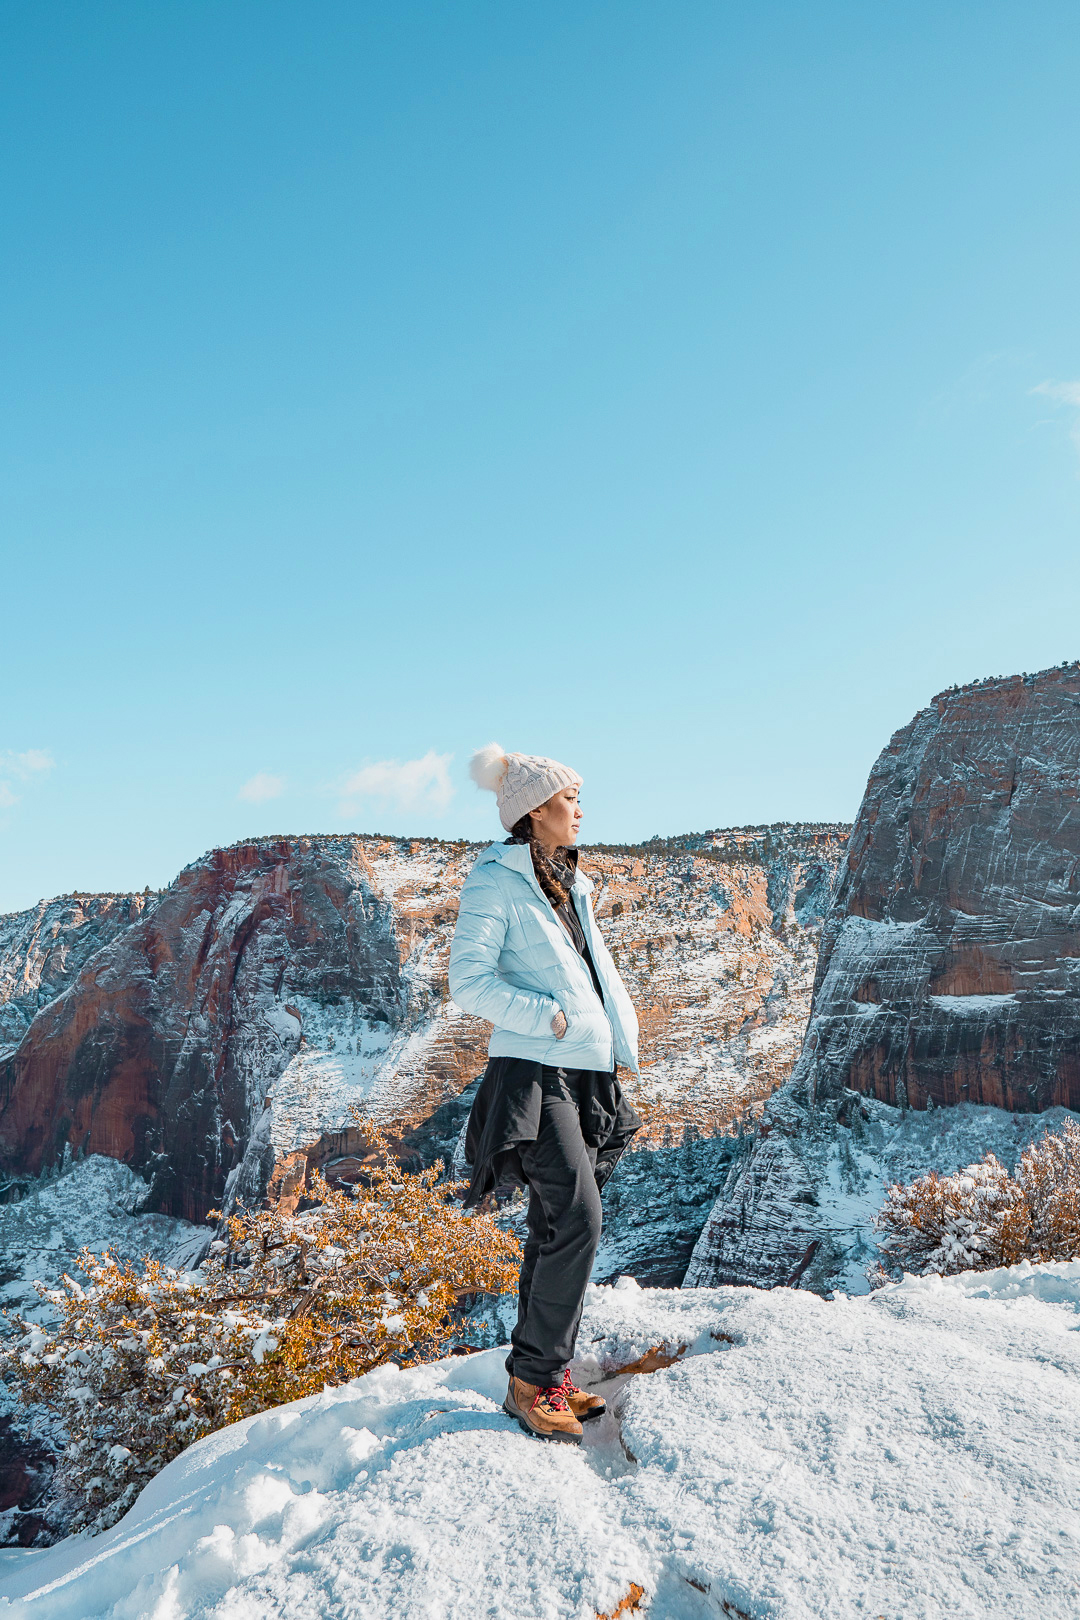 Angels Landing Summit During Winter